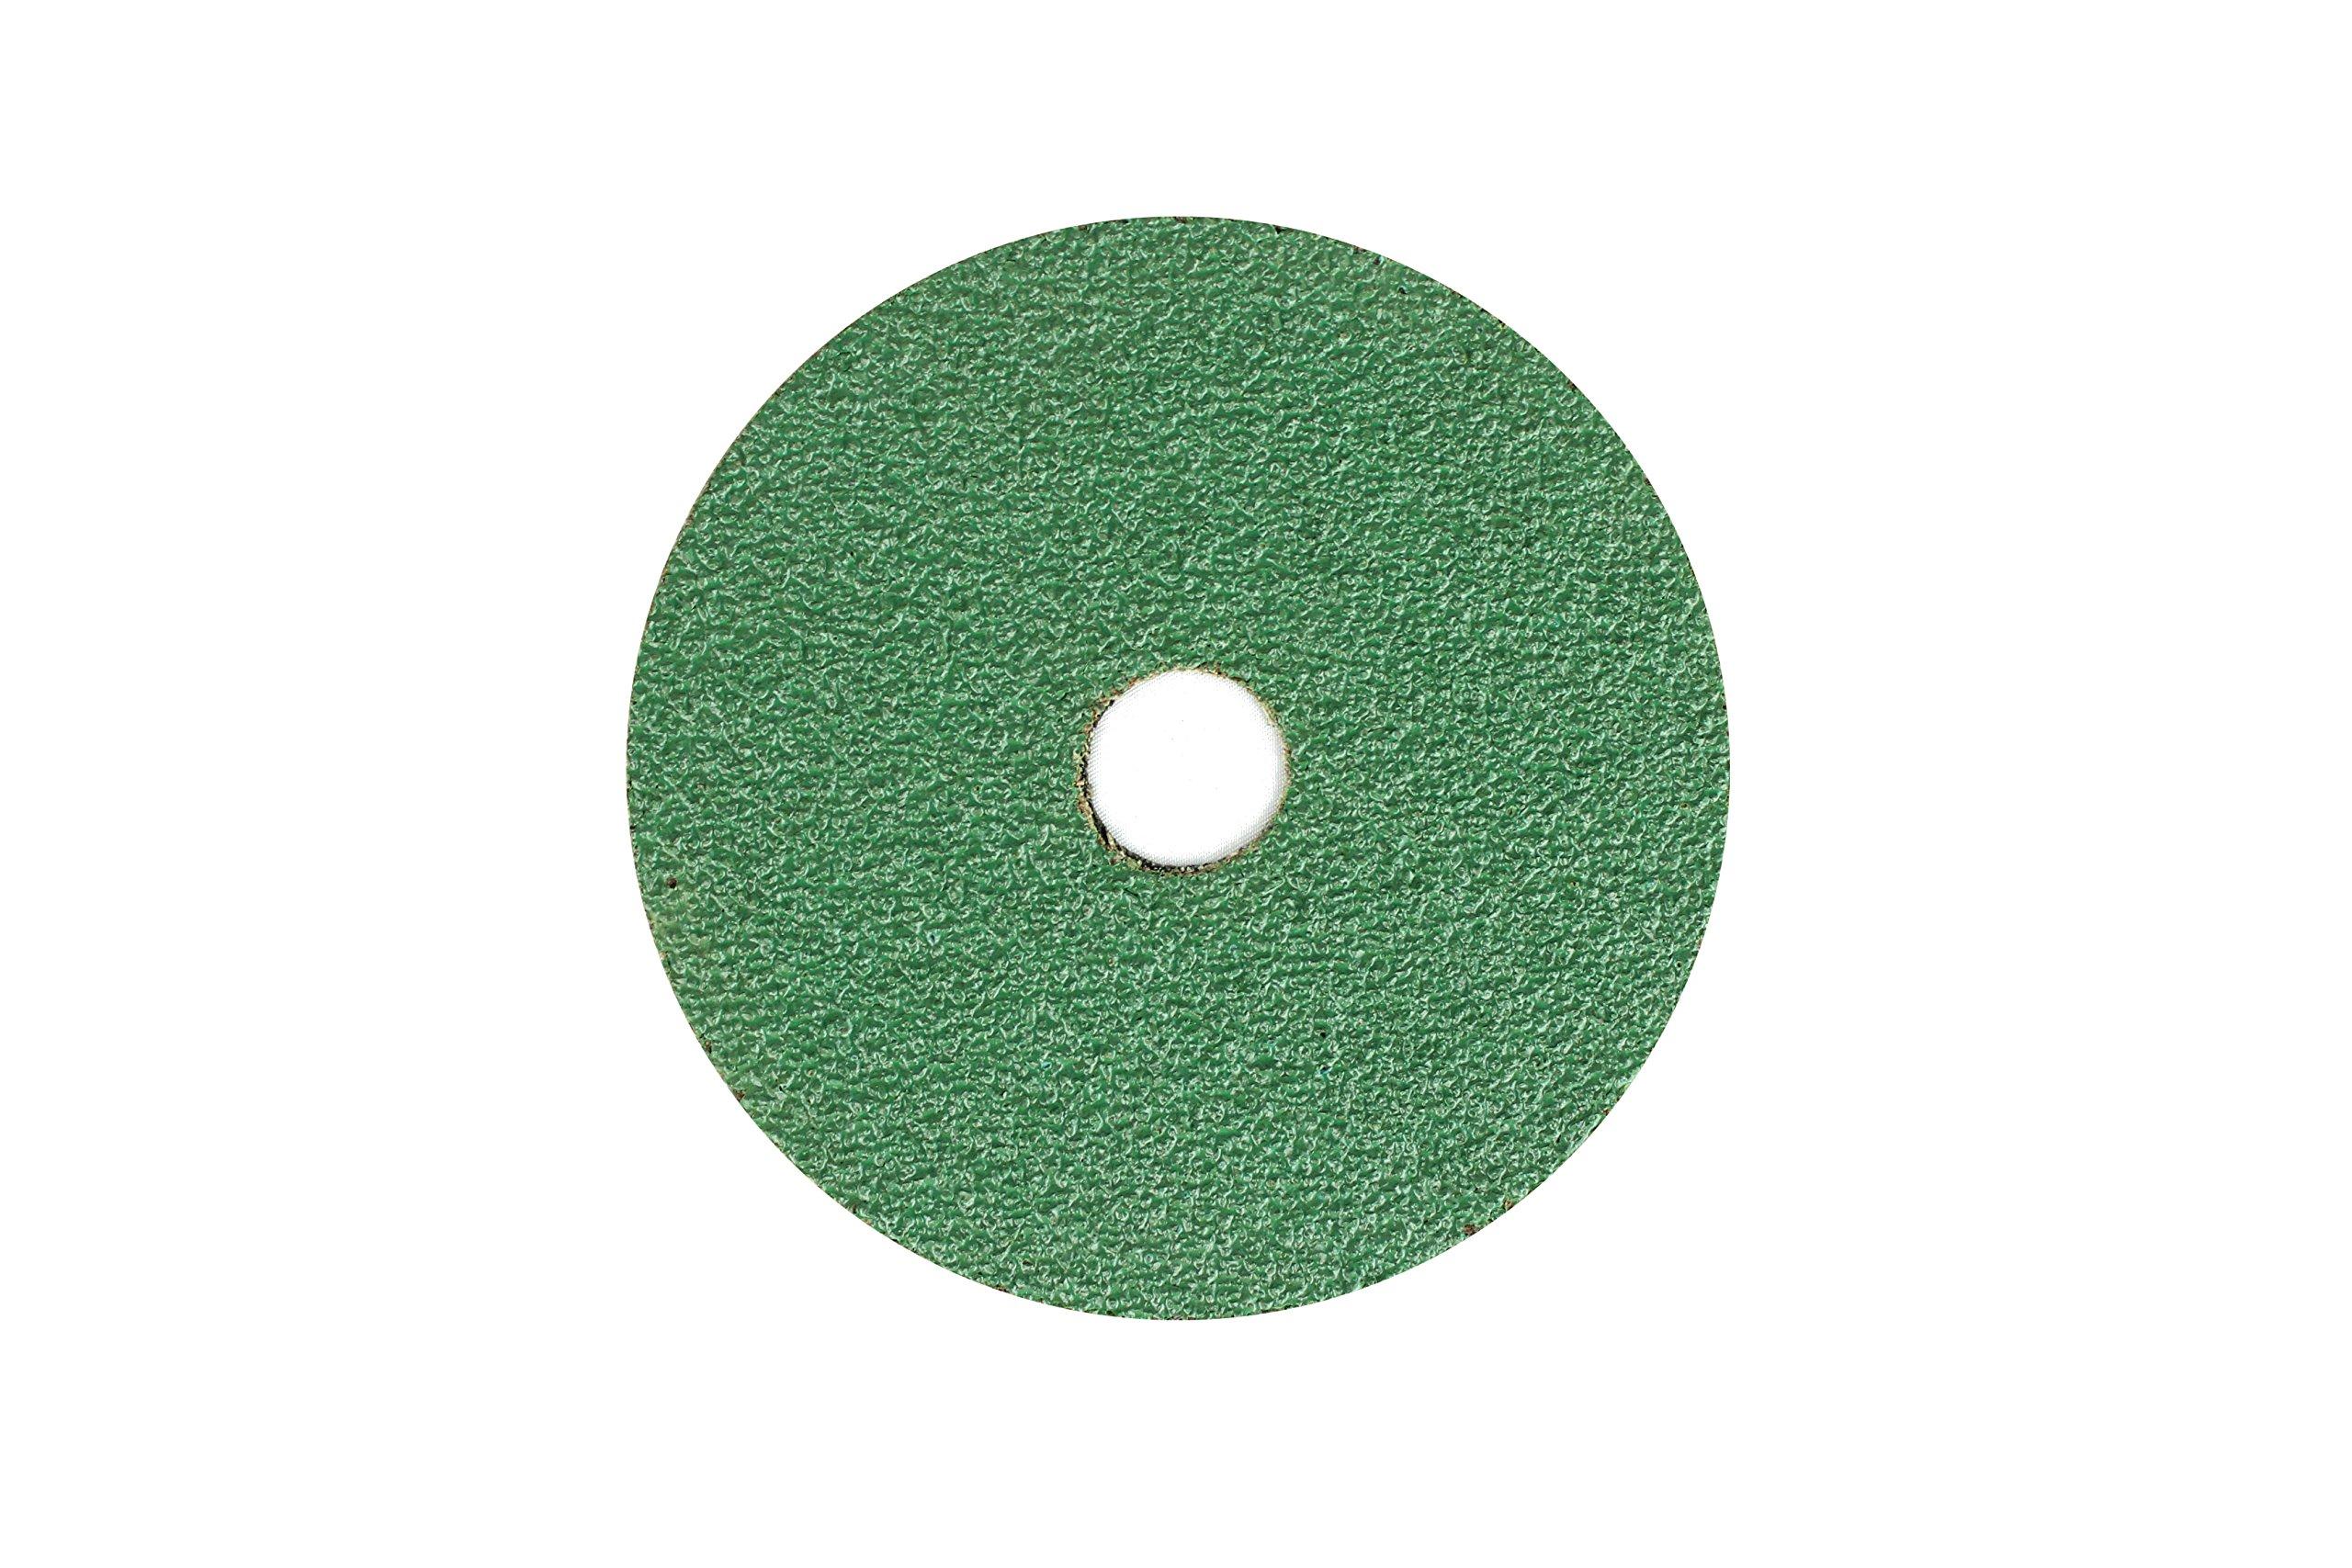 Sunmight 72302 1 Pack 5'' Alumina Zirconia Fibre Disc (Sundisc Grit 36) by Sunmight